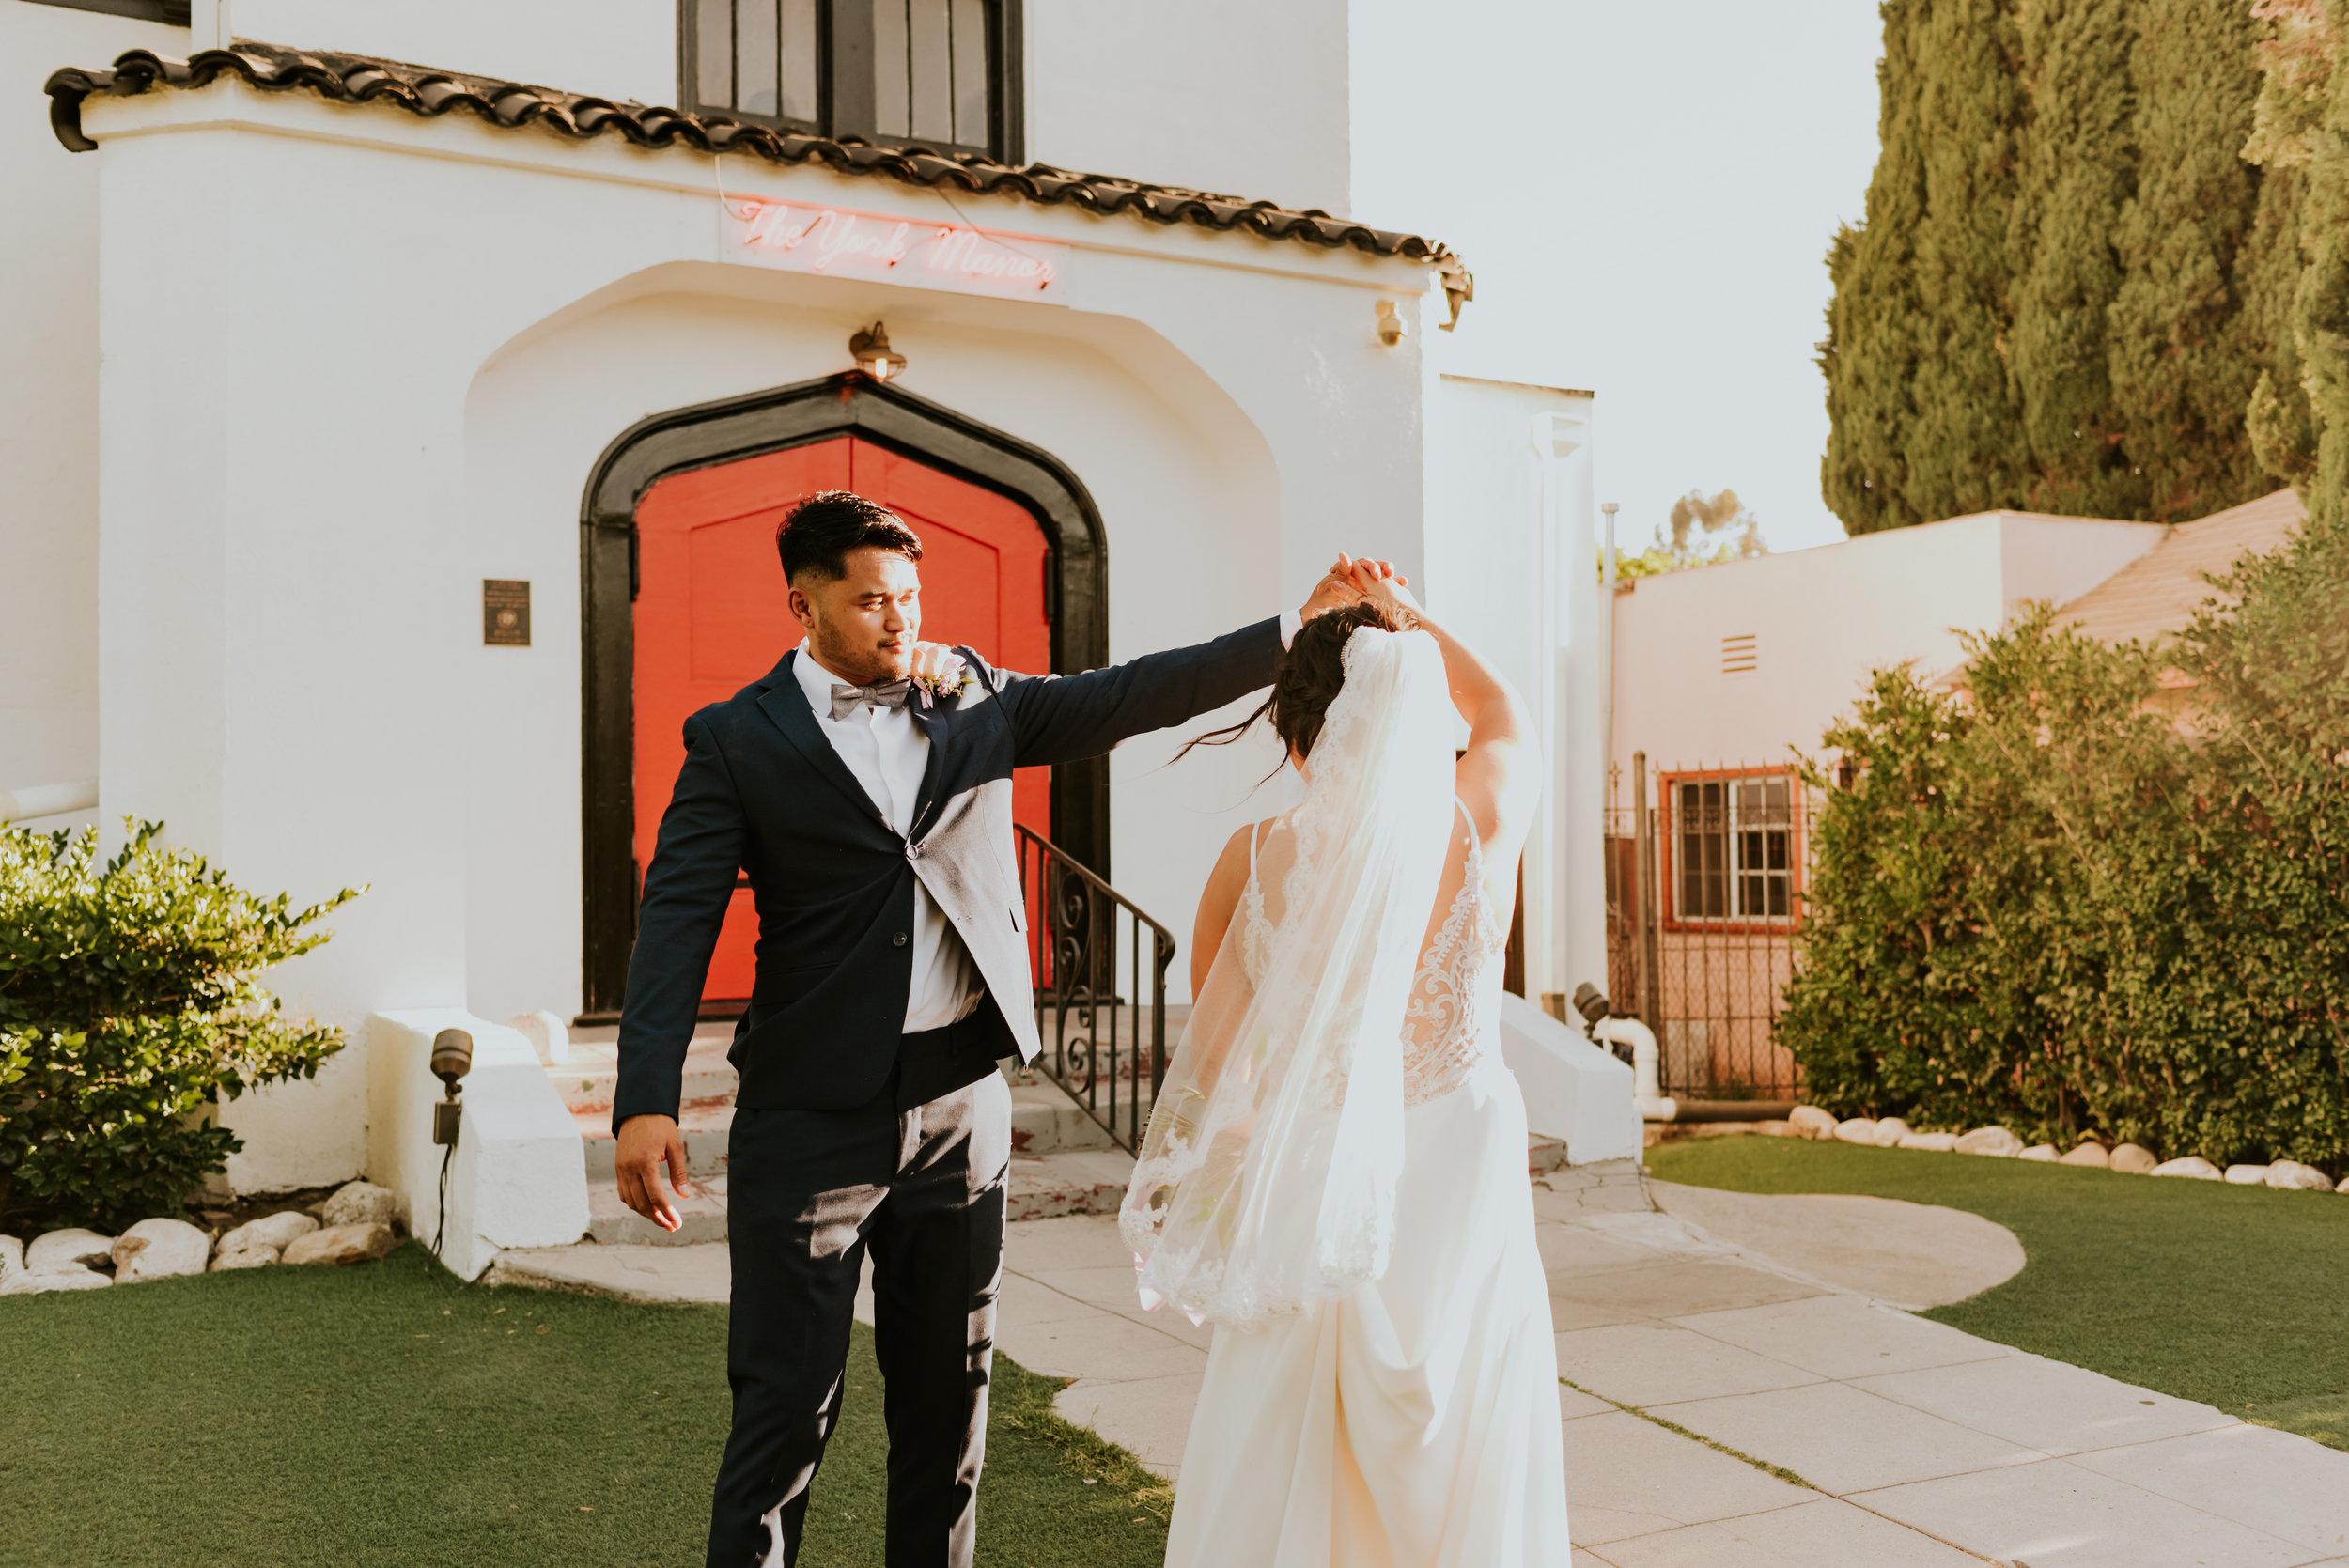 York Manor Wedding | Los Angeles, California | Los Angeles Wedding Photographer | Carrie Rogers Photography